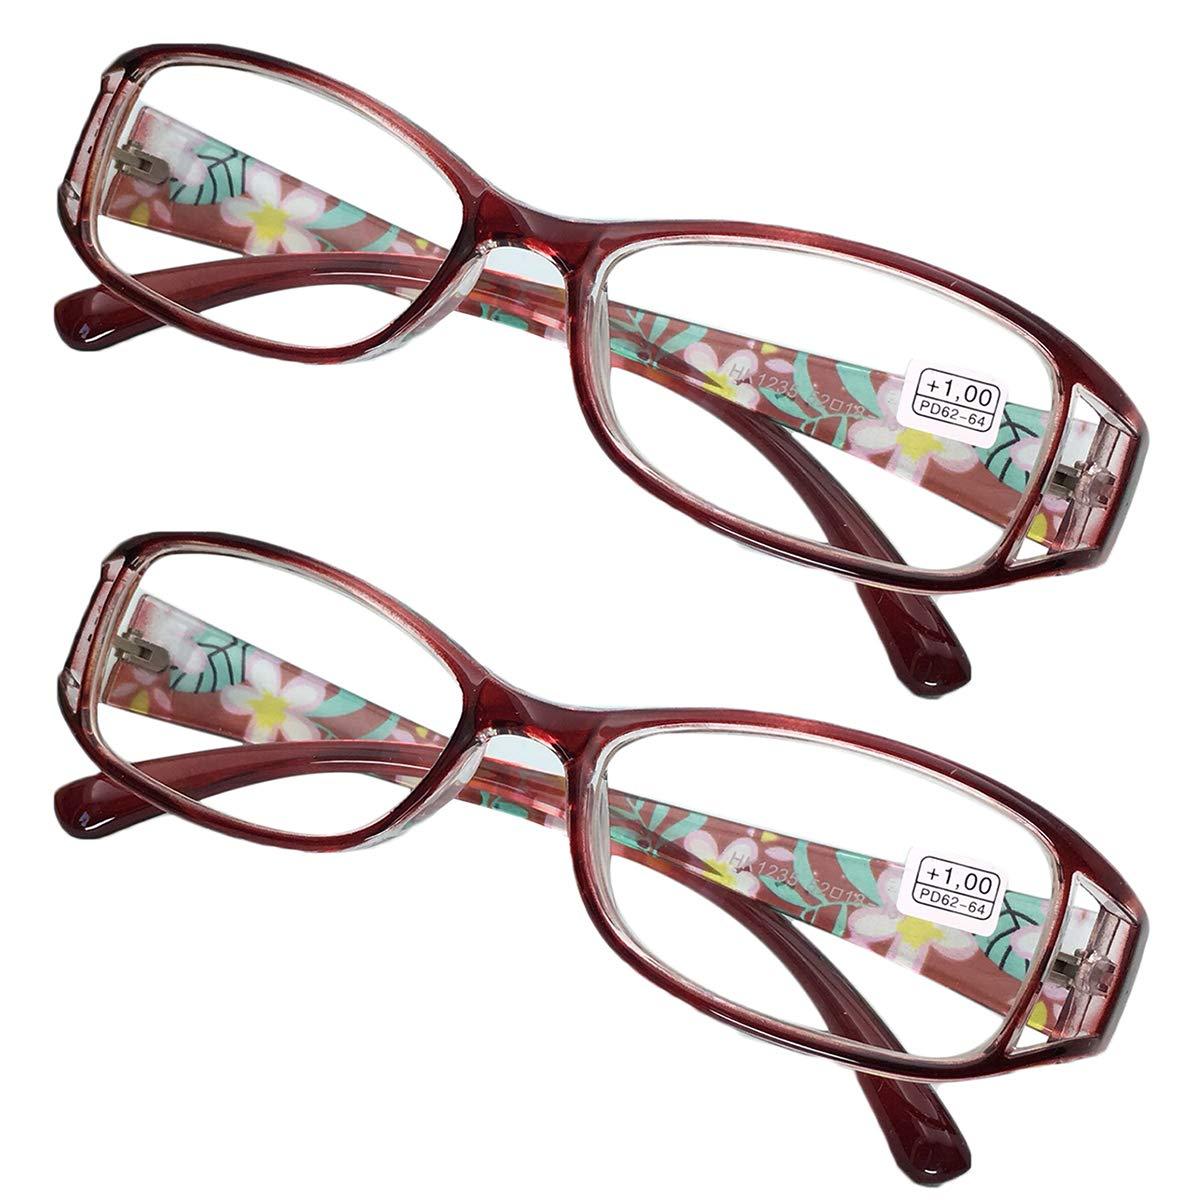 KOOSUFA Lesebrillen Damen Lesehilfe Sehhilfe Augenoptik Blumen Qualit/ät Vollrandbrille 1.0 1.5 2.0 2.5 3.0 3.5 4.0 4.5 5.0 5.5 6.0